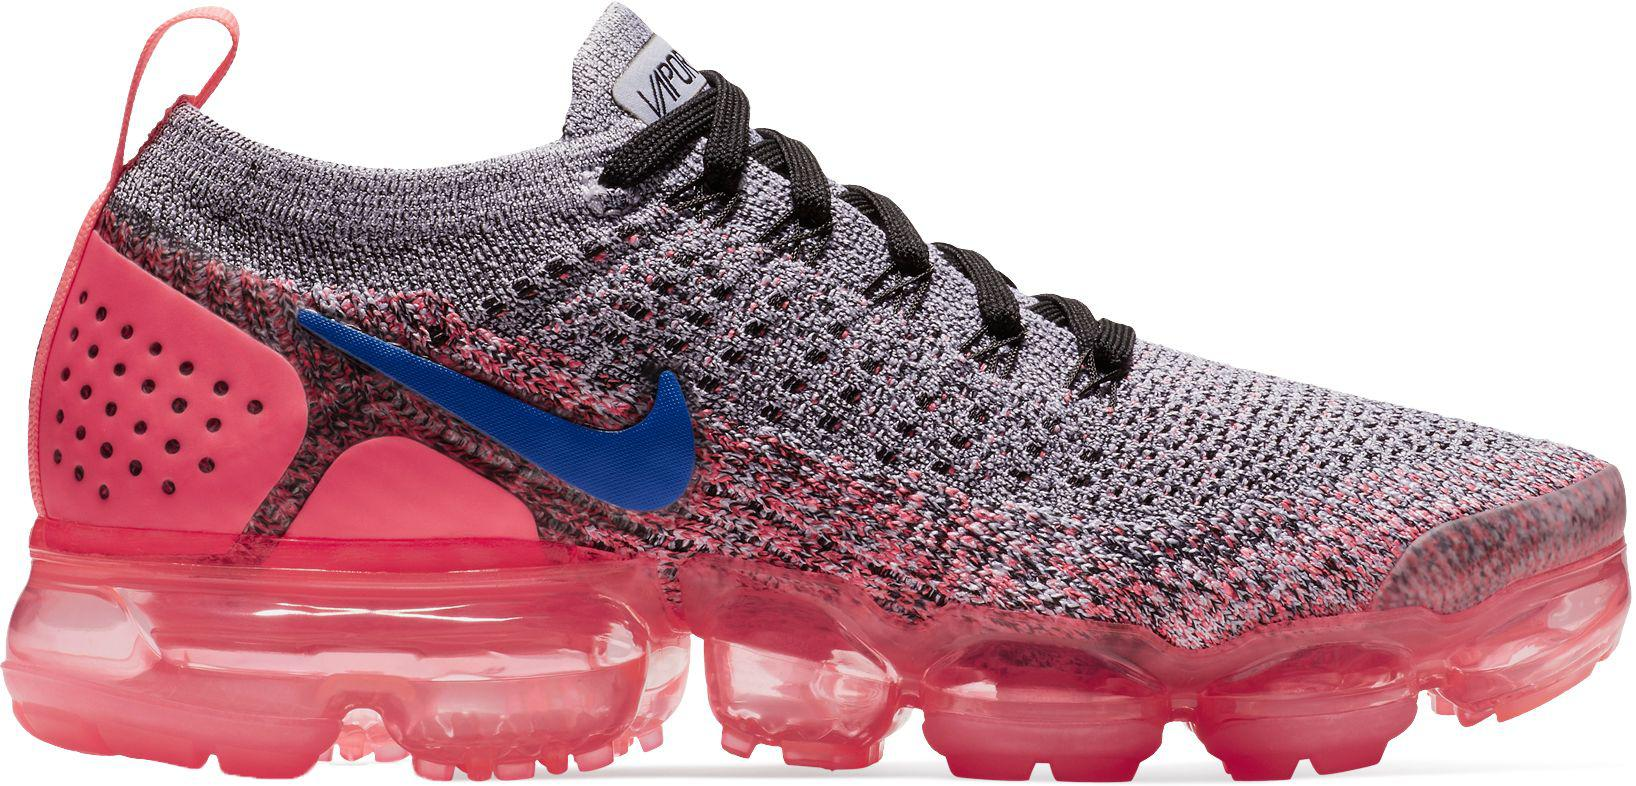 9bca2fffaf70 Nike - Multicolor Air Vapormax Flyknit 2 Running Shoes for Men - Lyst